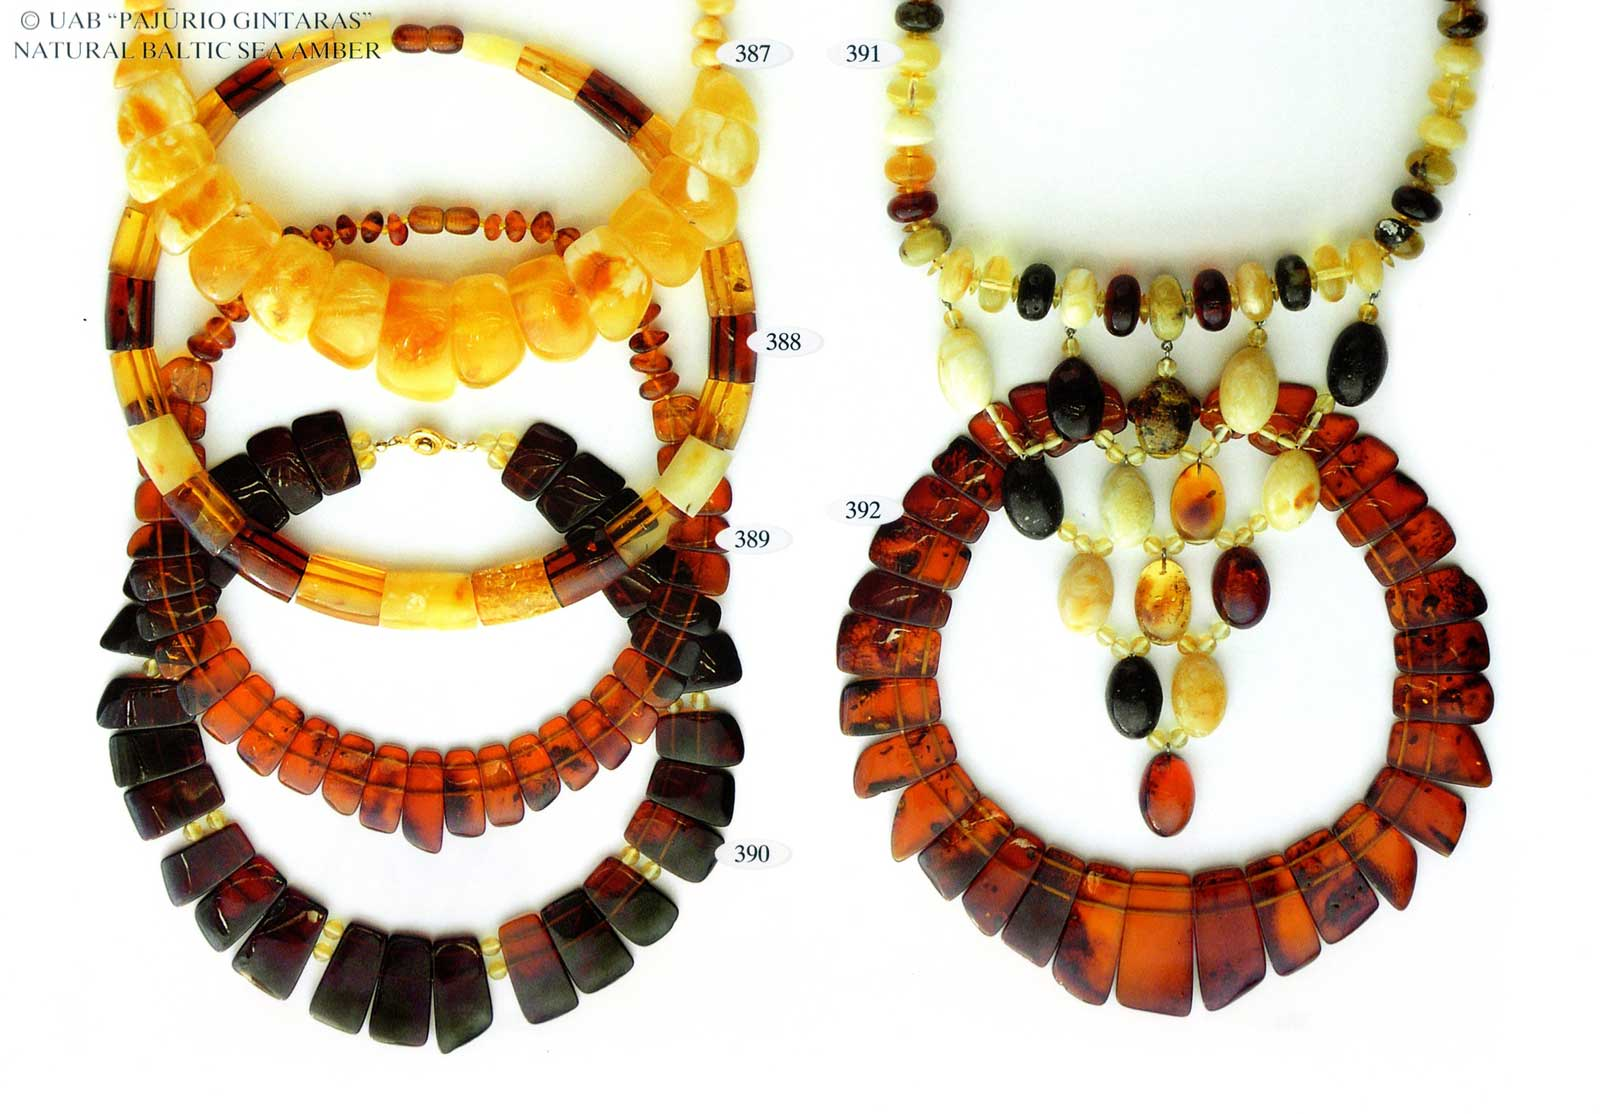 387-392 bernsteinkette großhandel